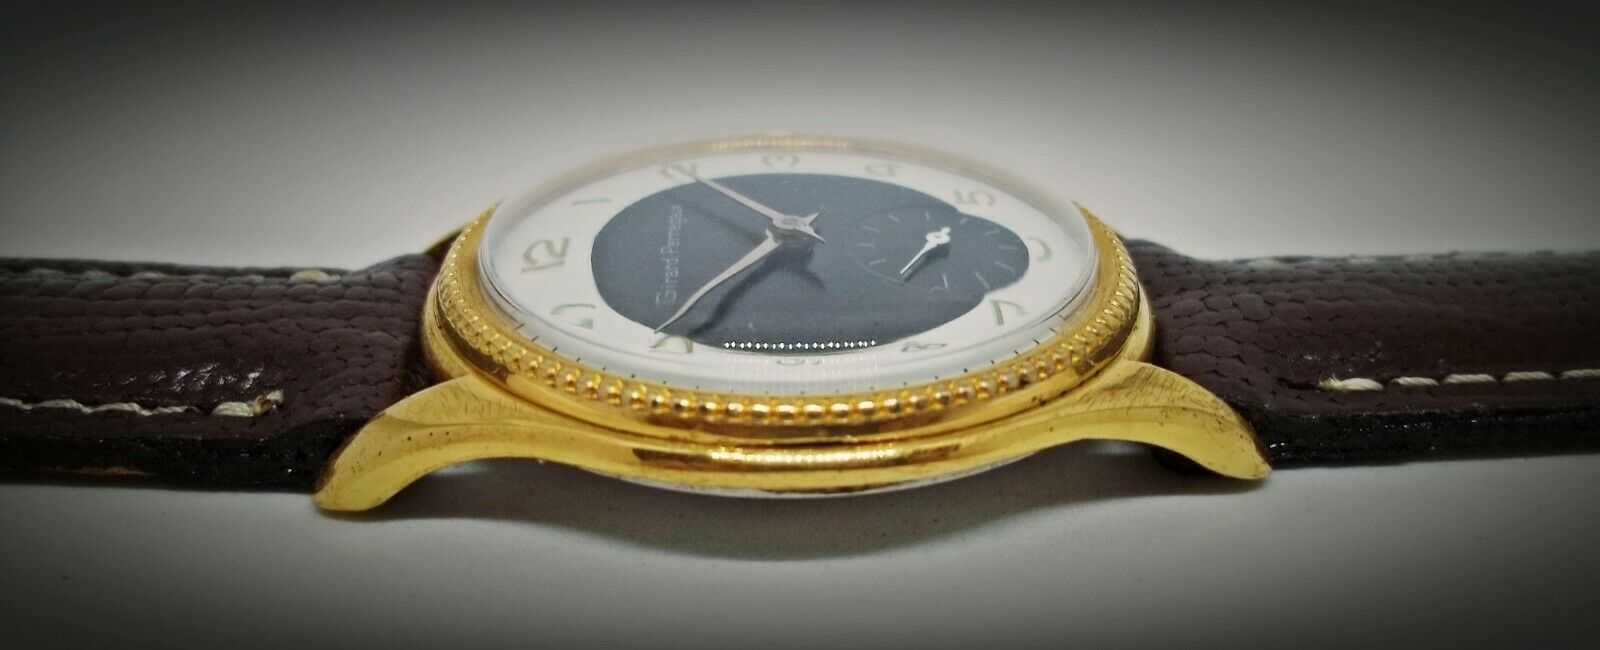 Lot 41 - Girard Perregaux- Beautiful vintage swiss made watch